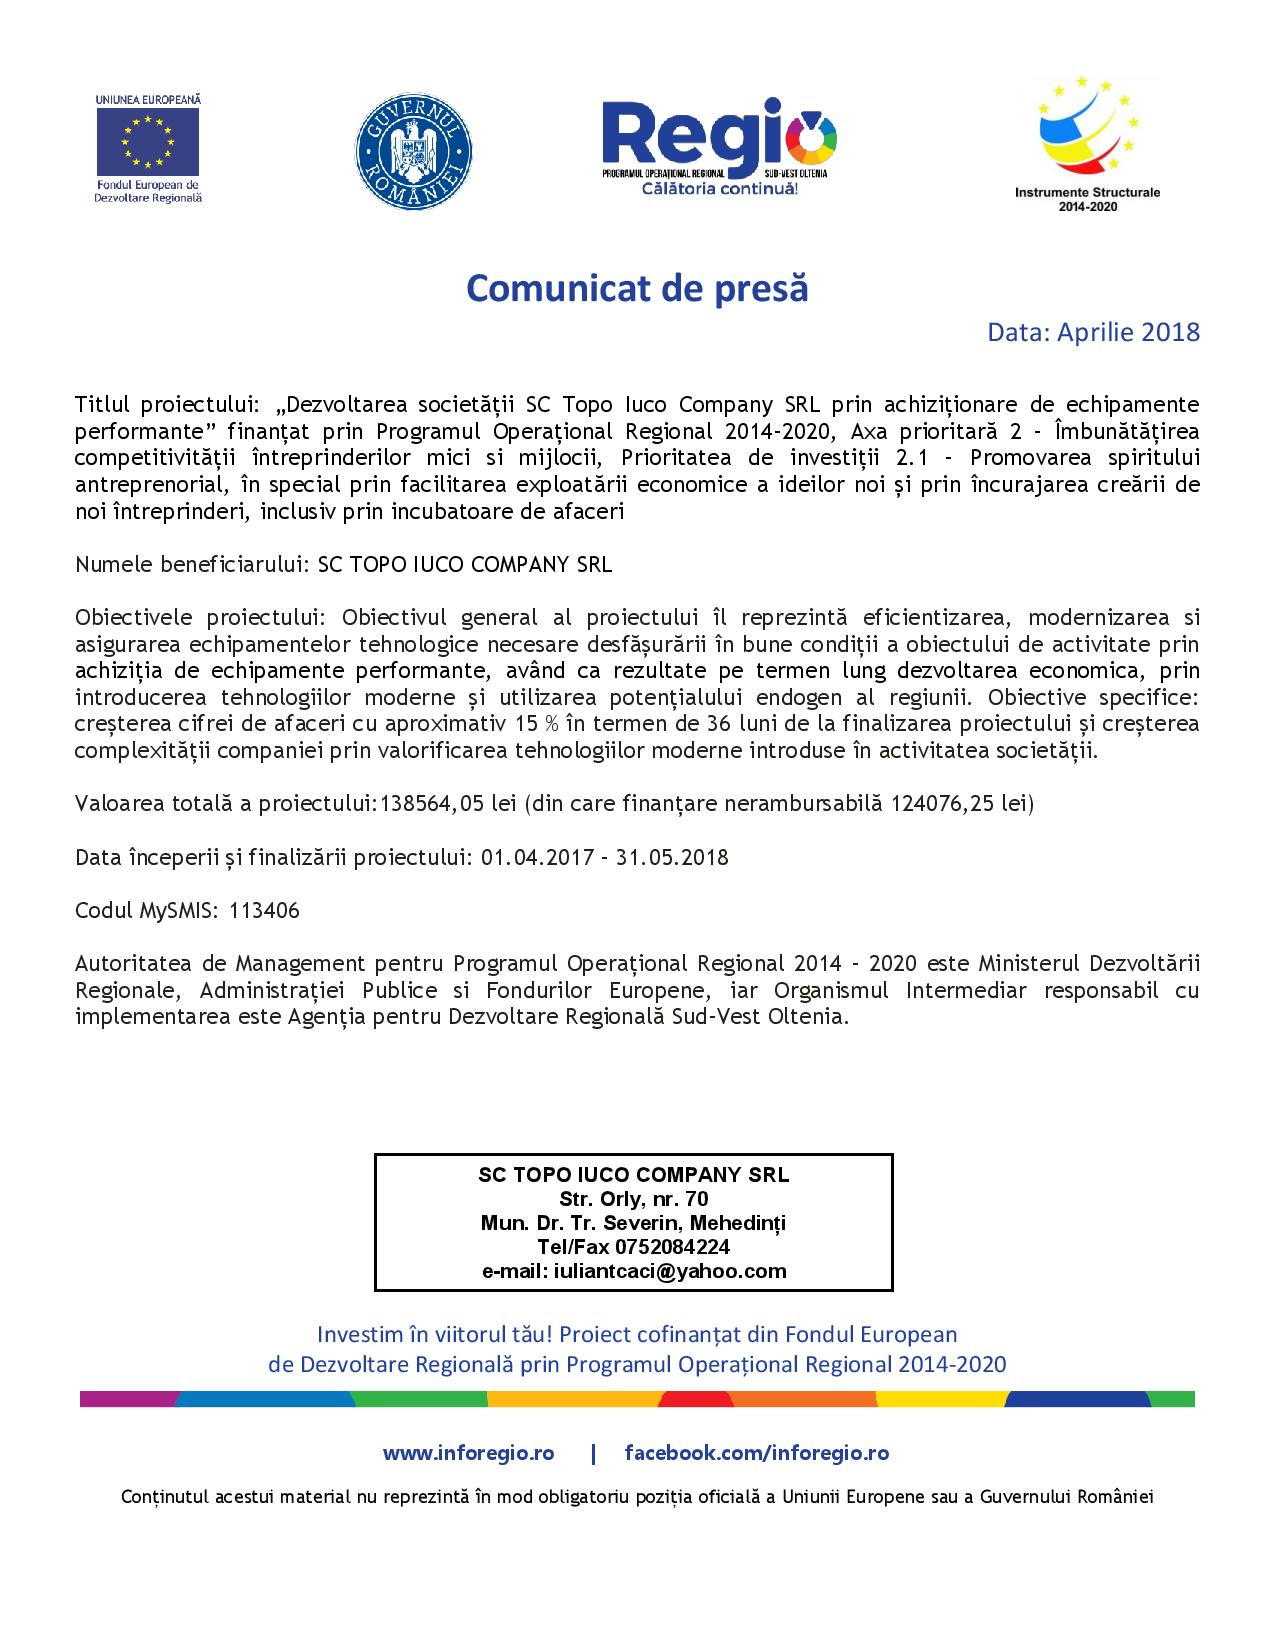 Dezvoltarea societății SC Topo Iuco Company SRL prin achiziționare de echipamente performante